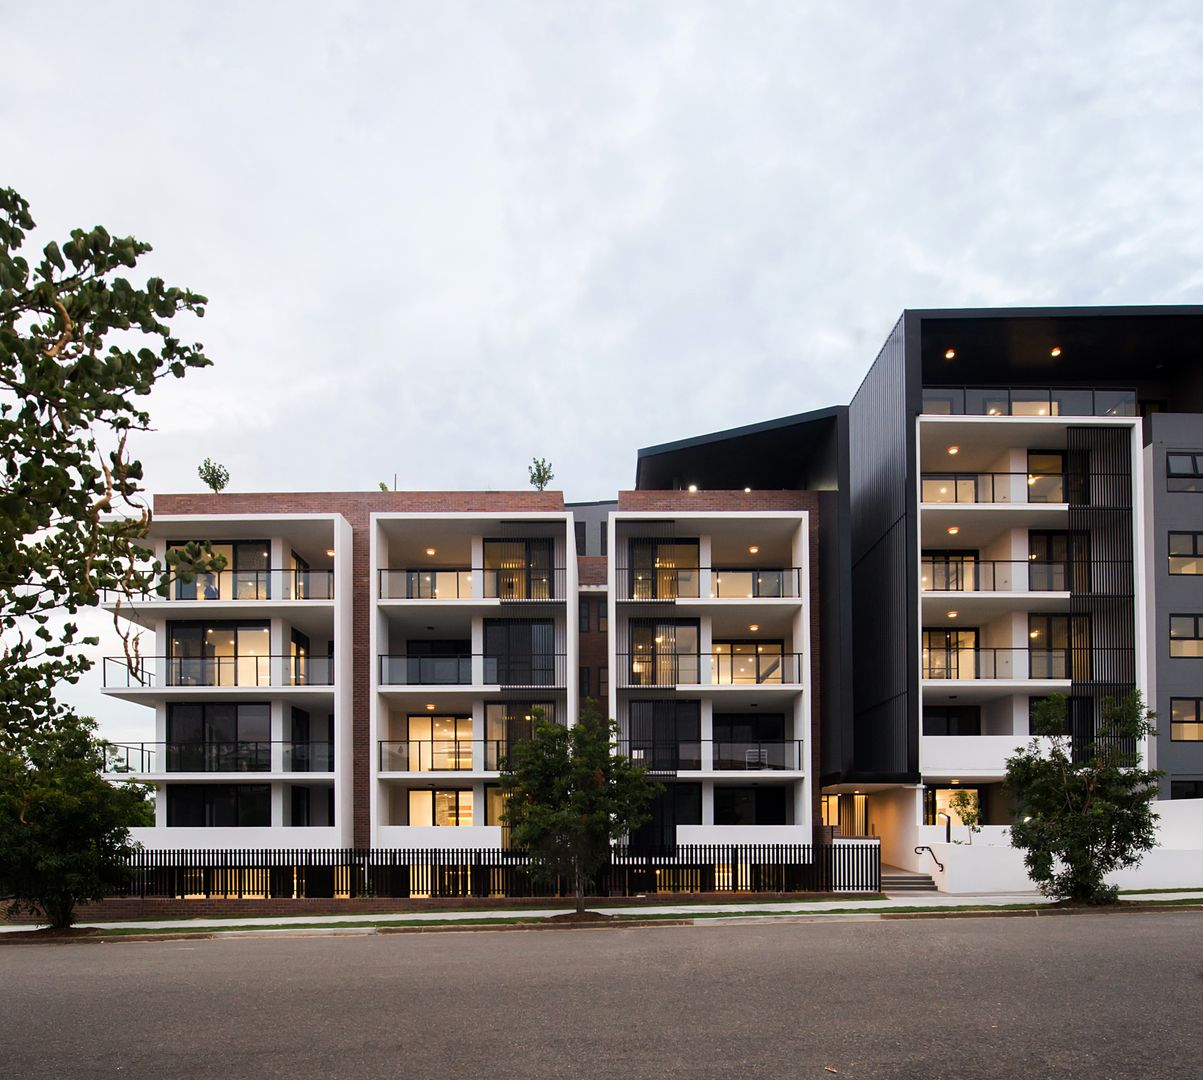 502/18-26 Mermaid Street, Chermside QLD 4032, Image 0